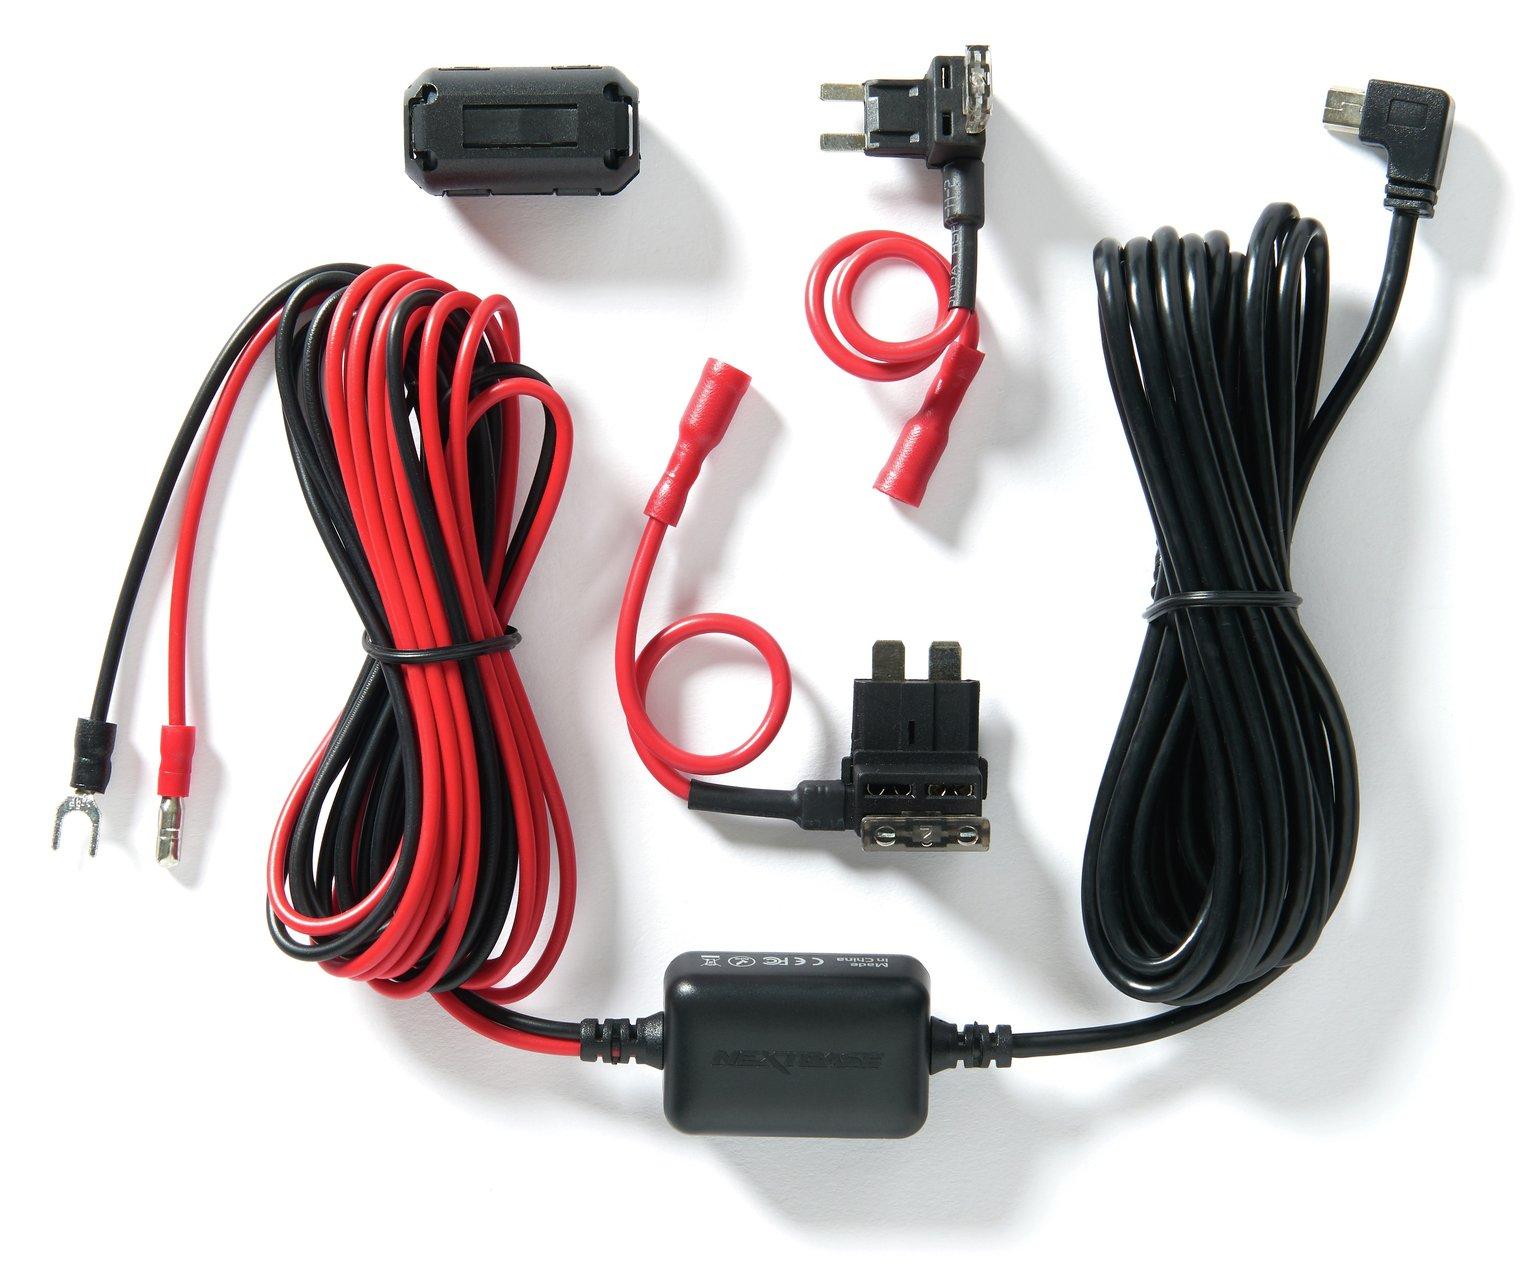 Nextbase Series 2 Hardwire Kit